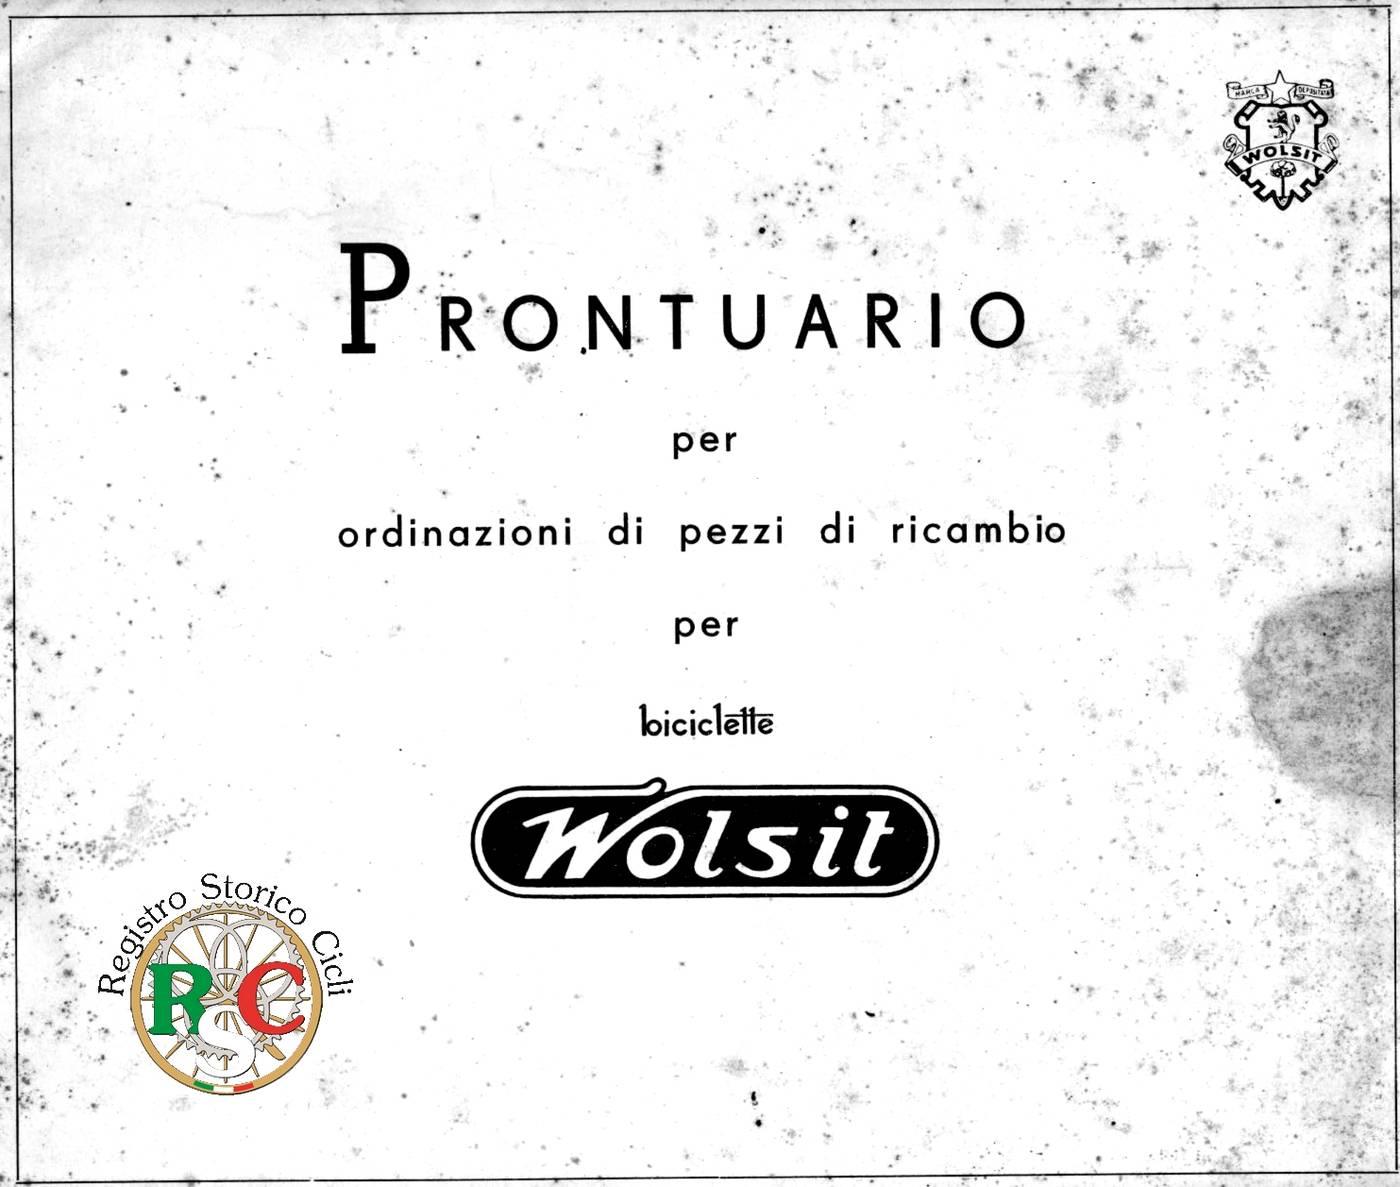 RSC - Catalogo Ricambi Wolsit 1950 - 1